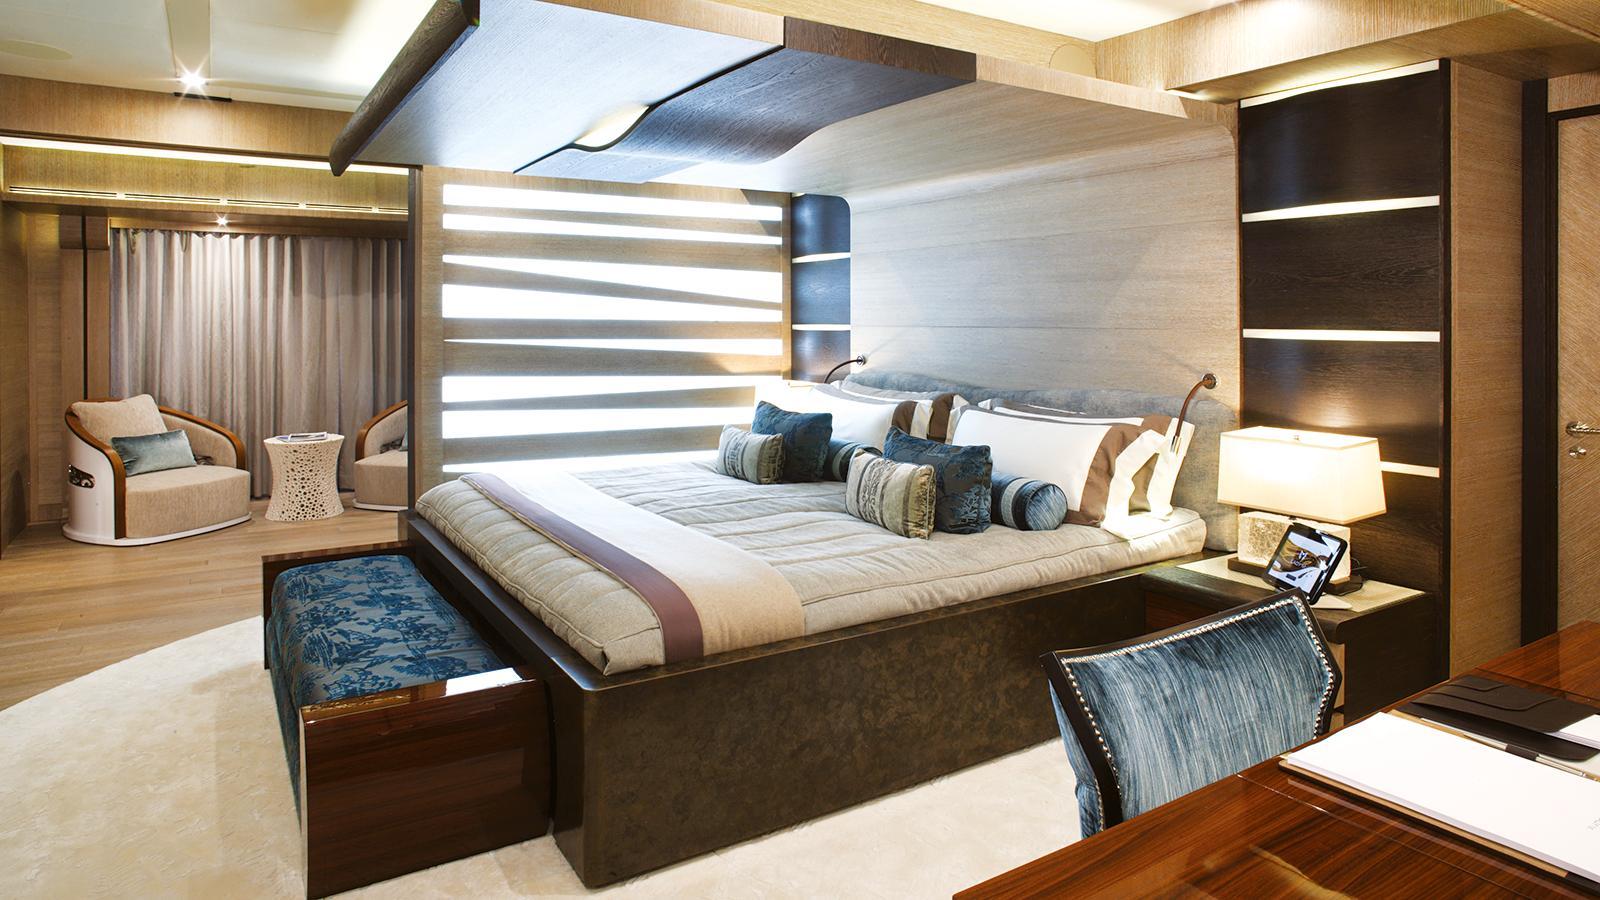 lady-m-motor-yacht-palmer-johnson-2013-64m-stateroom